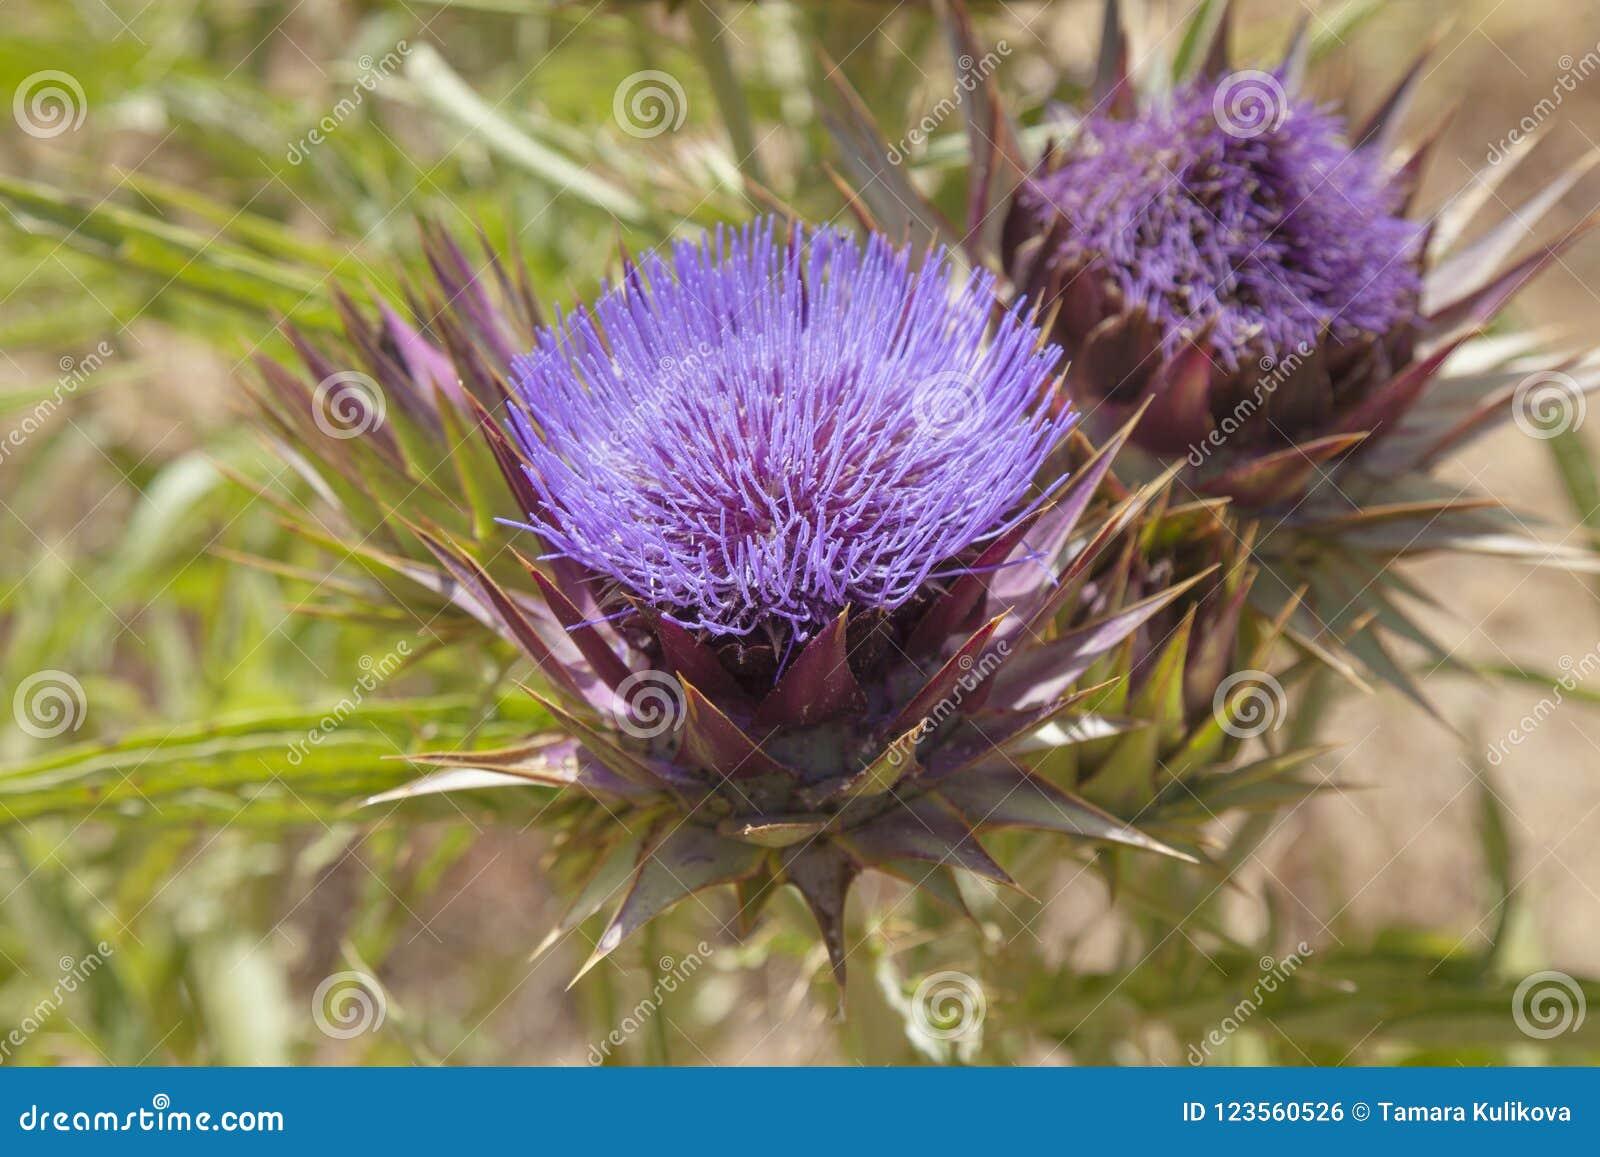 Flora van Gran Canaria - bolartisjok